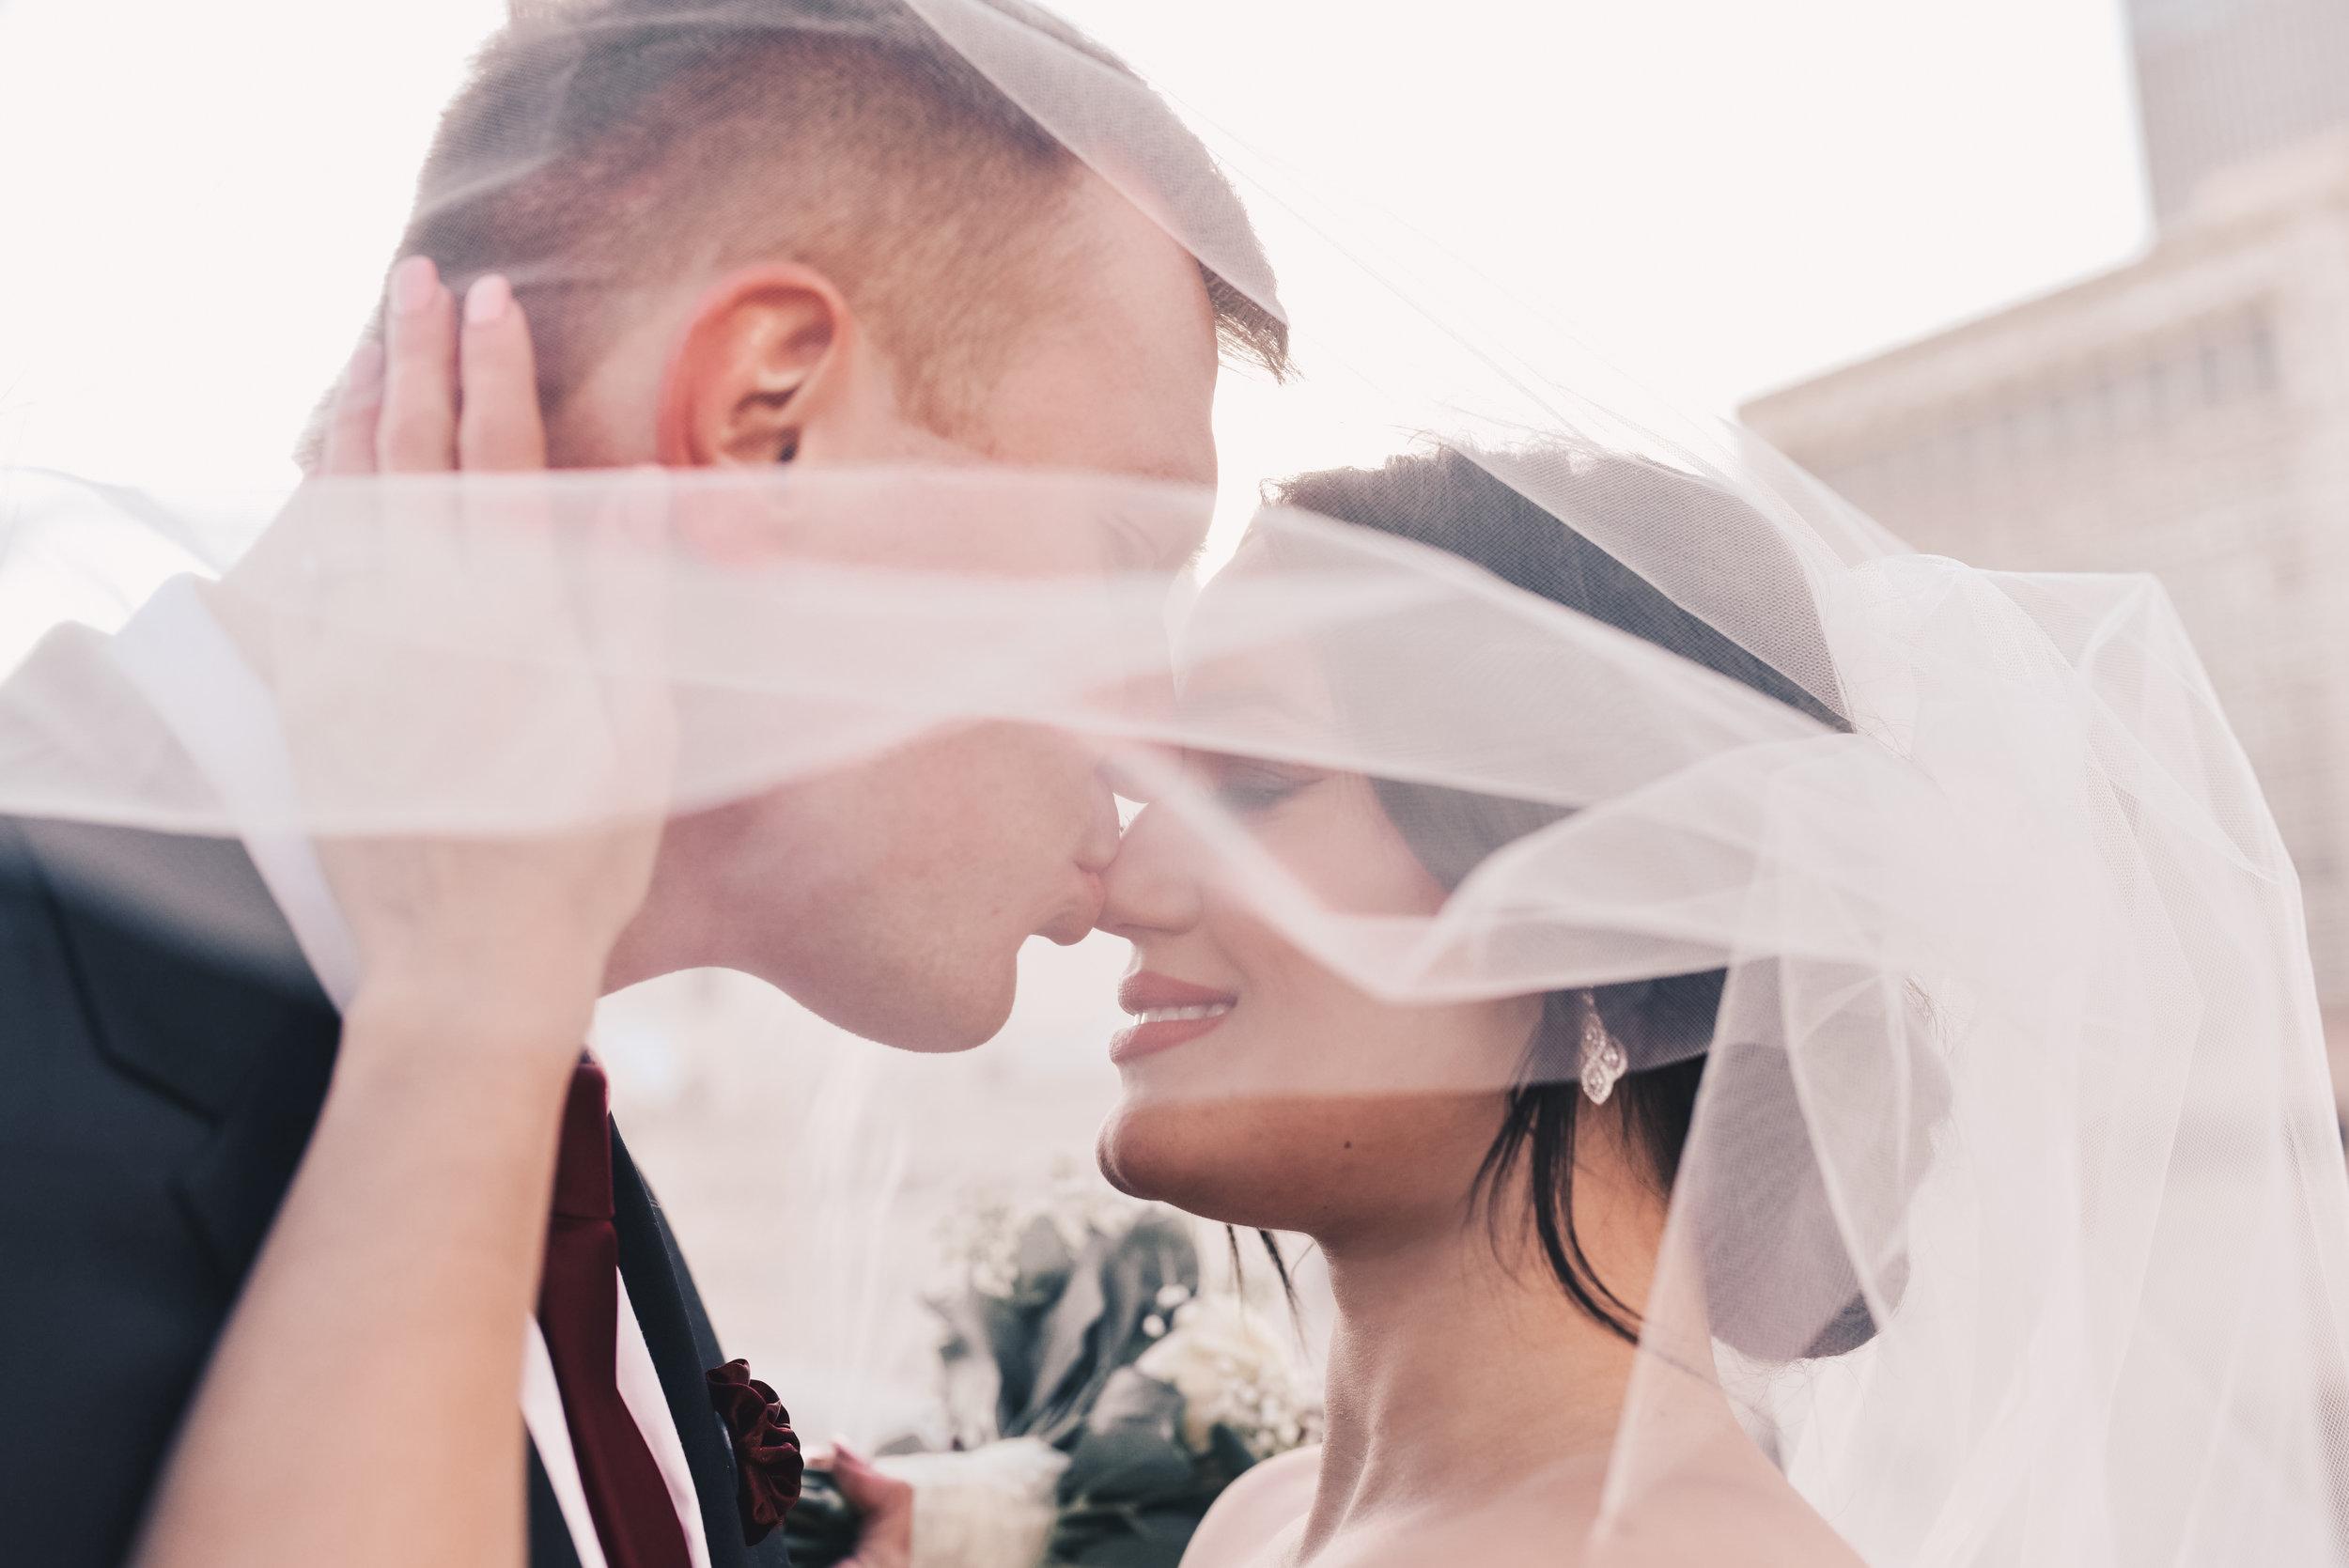 Millennium Park Wedding Photos, Millennium Park, Chicago Bride and Groom Photos, Chicago Wedding Photographer